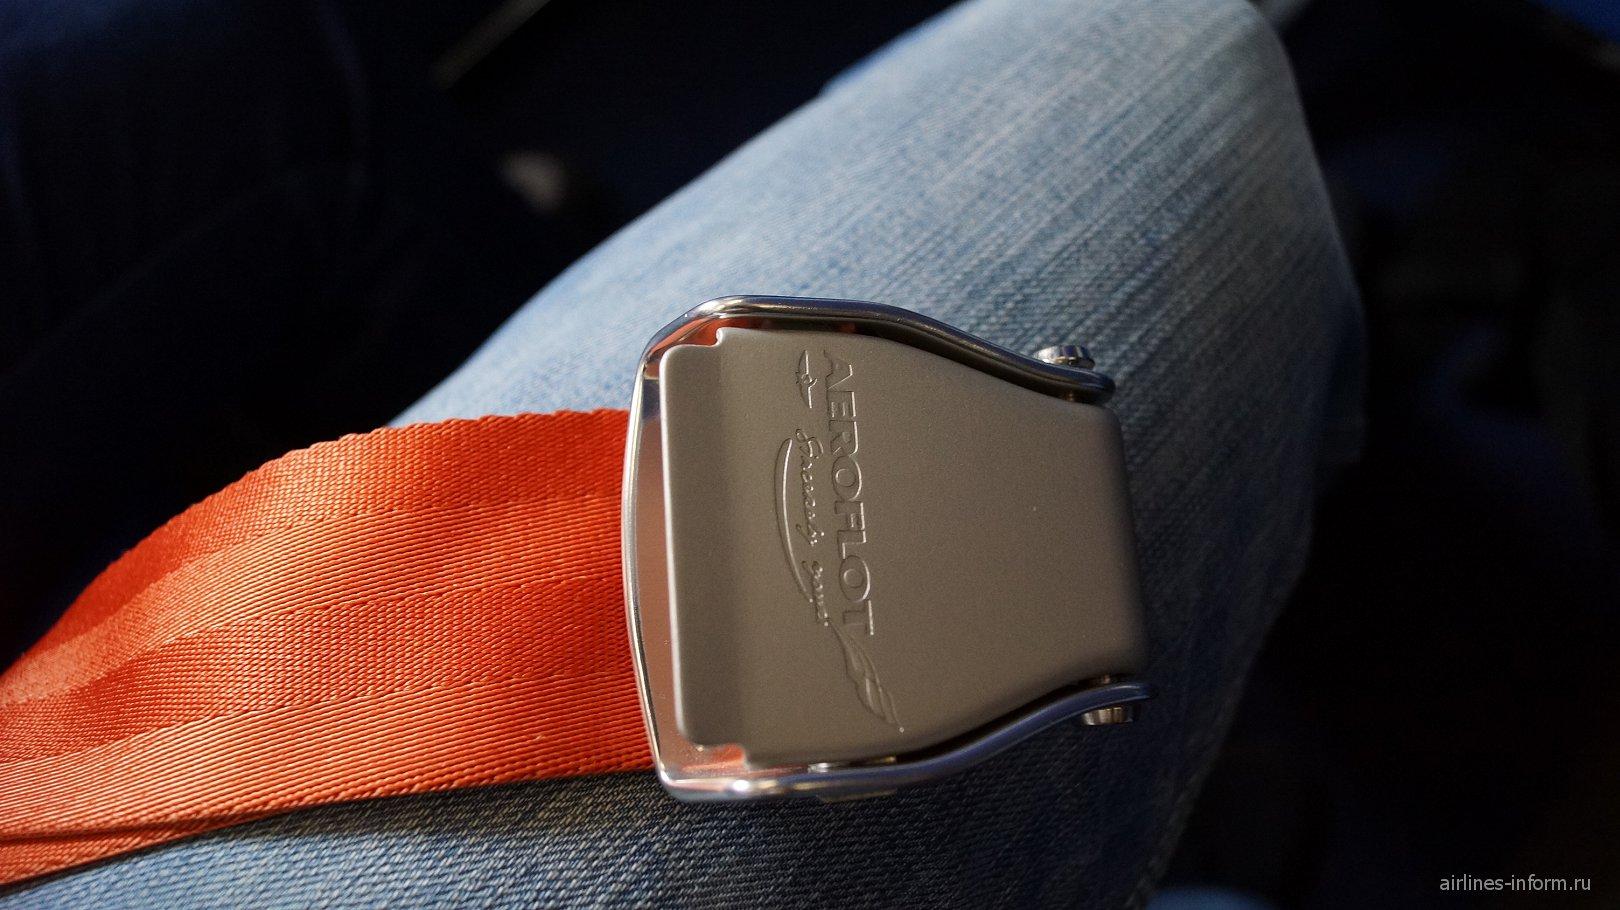 Логотип Аэрофлота на пряжке ремня